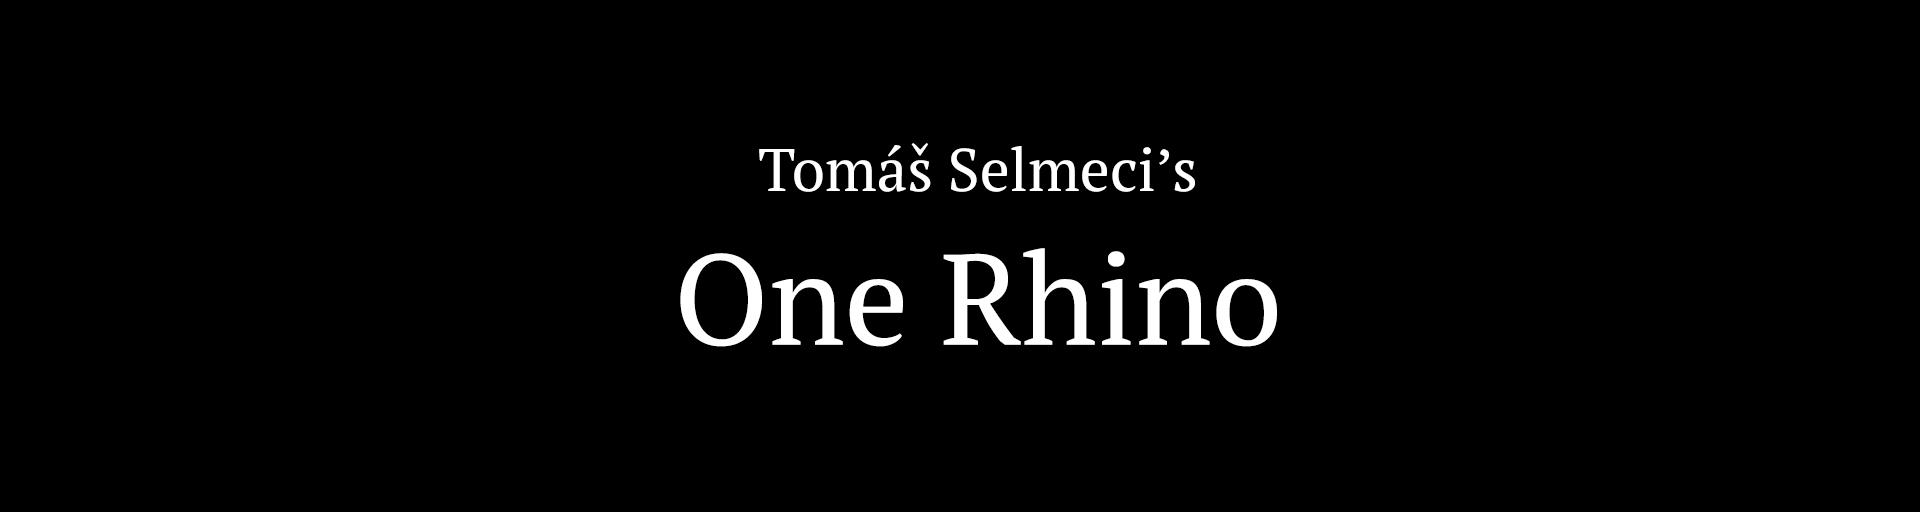 One Rhino